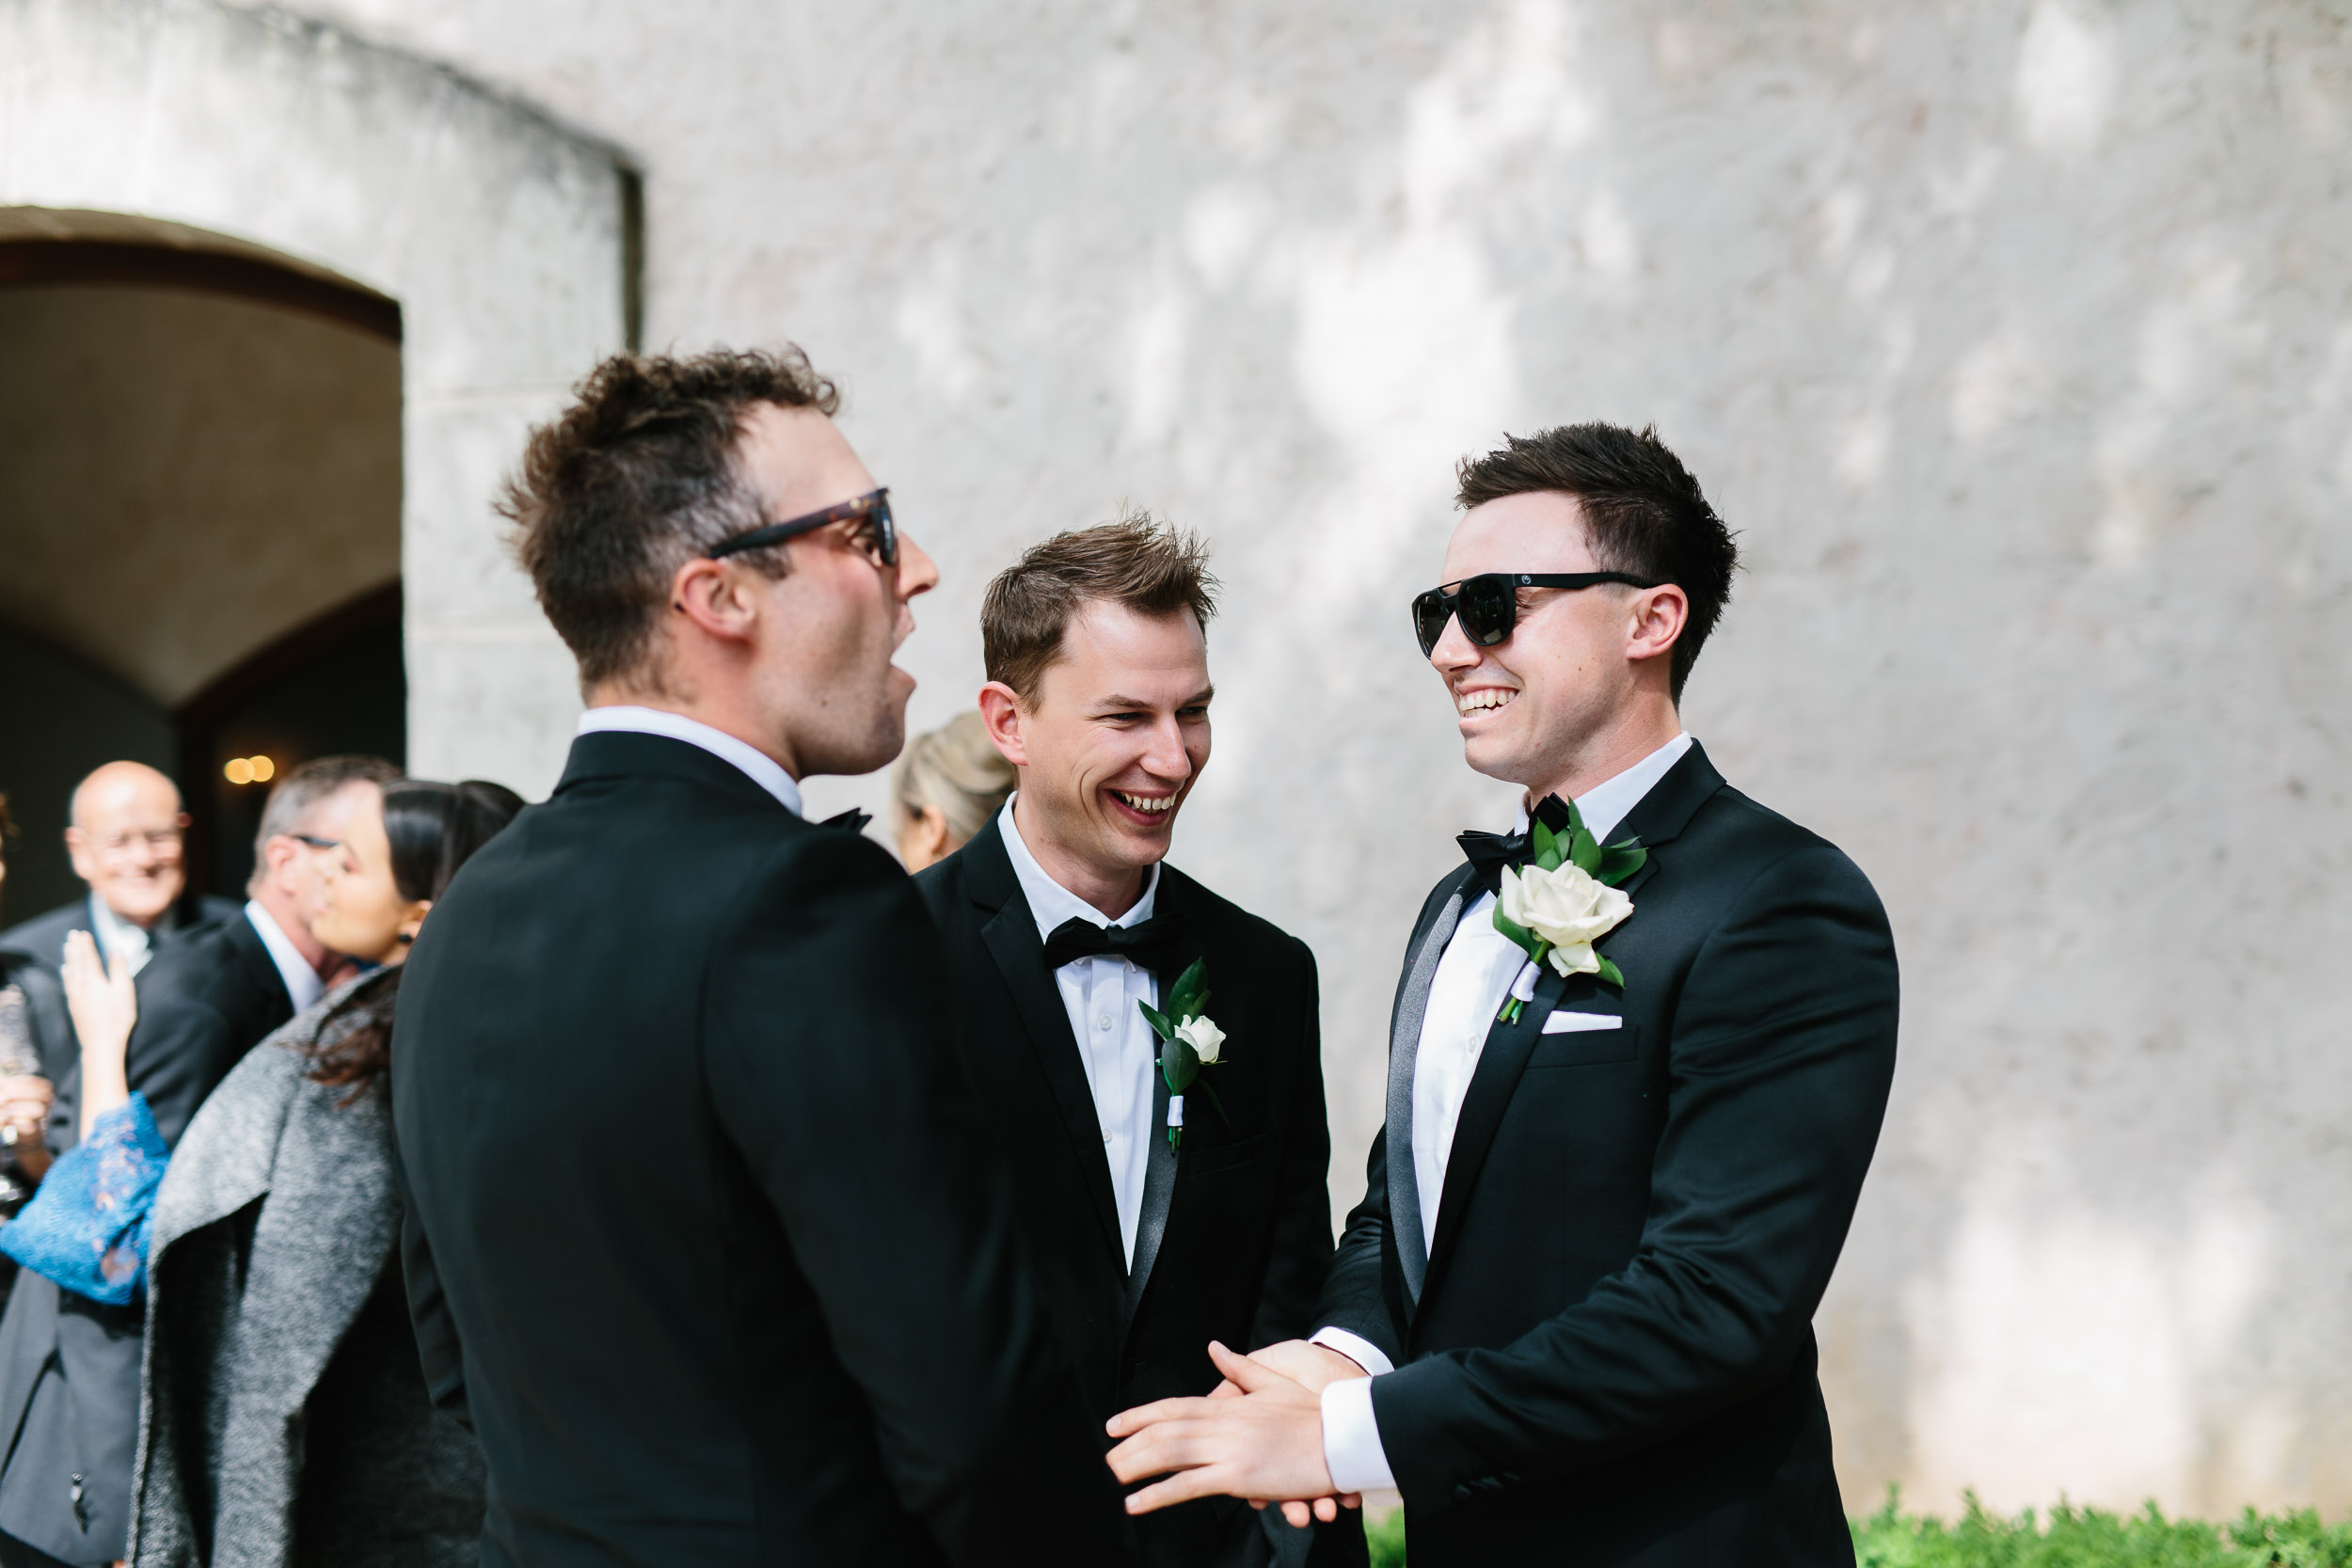 Kas-Richards-Stones-of-the-Yarra-Valley-Wedding-206.jpg